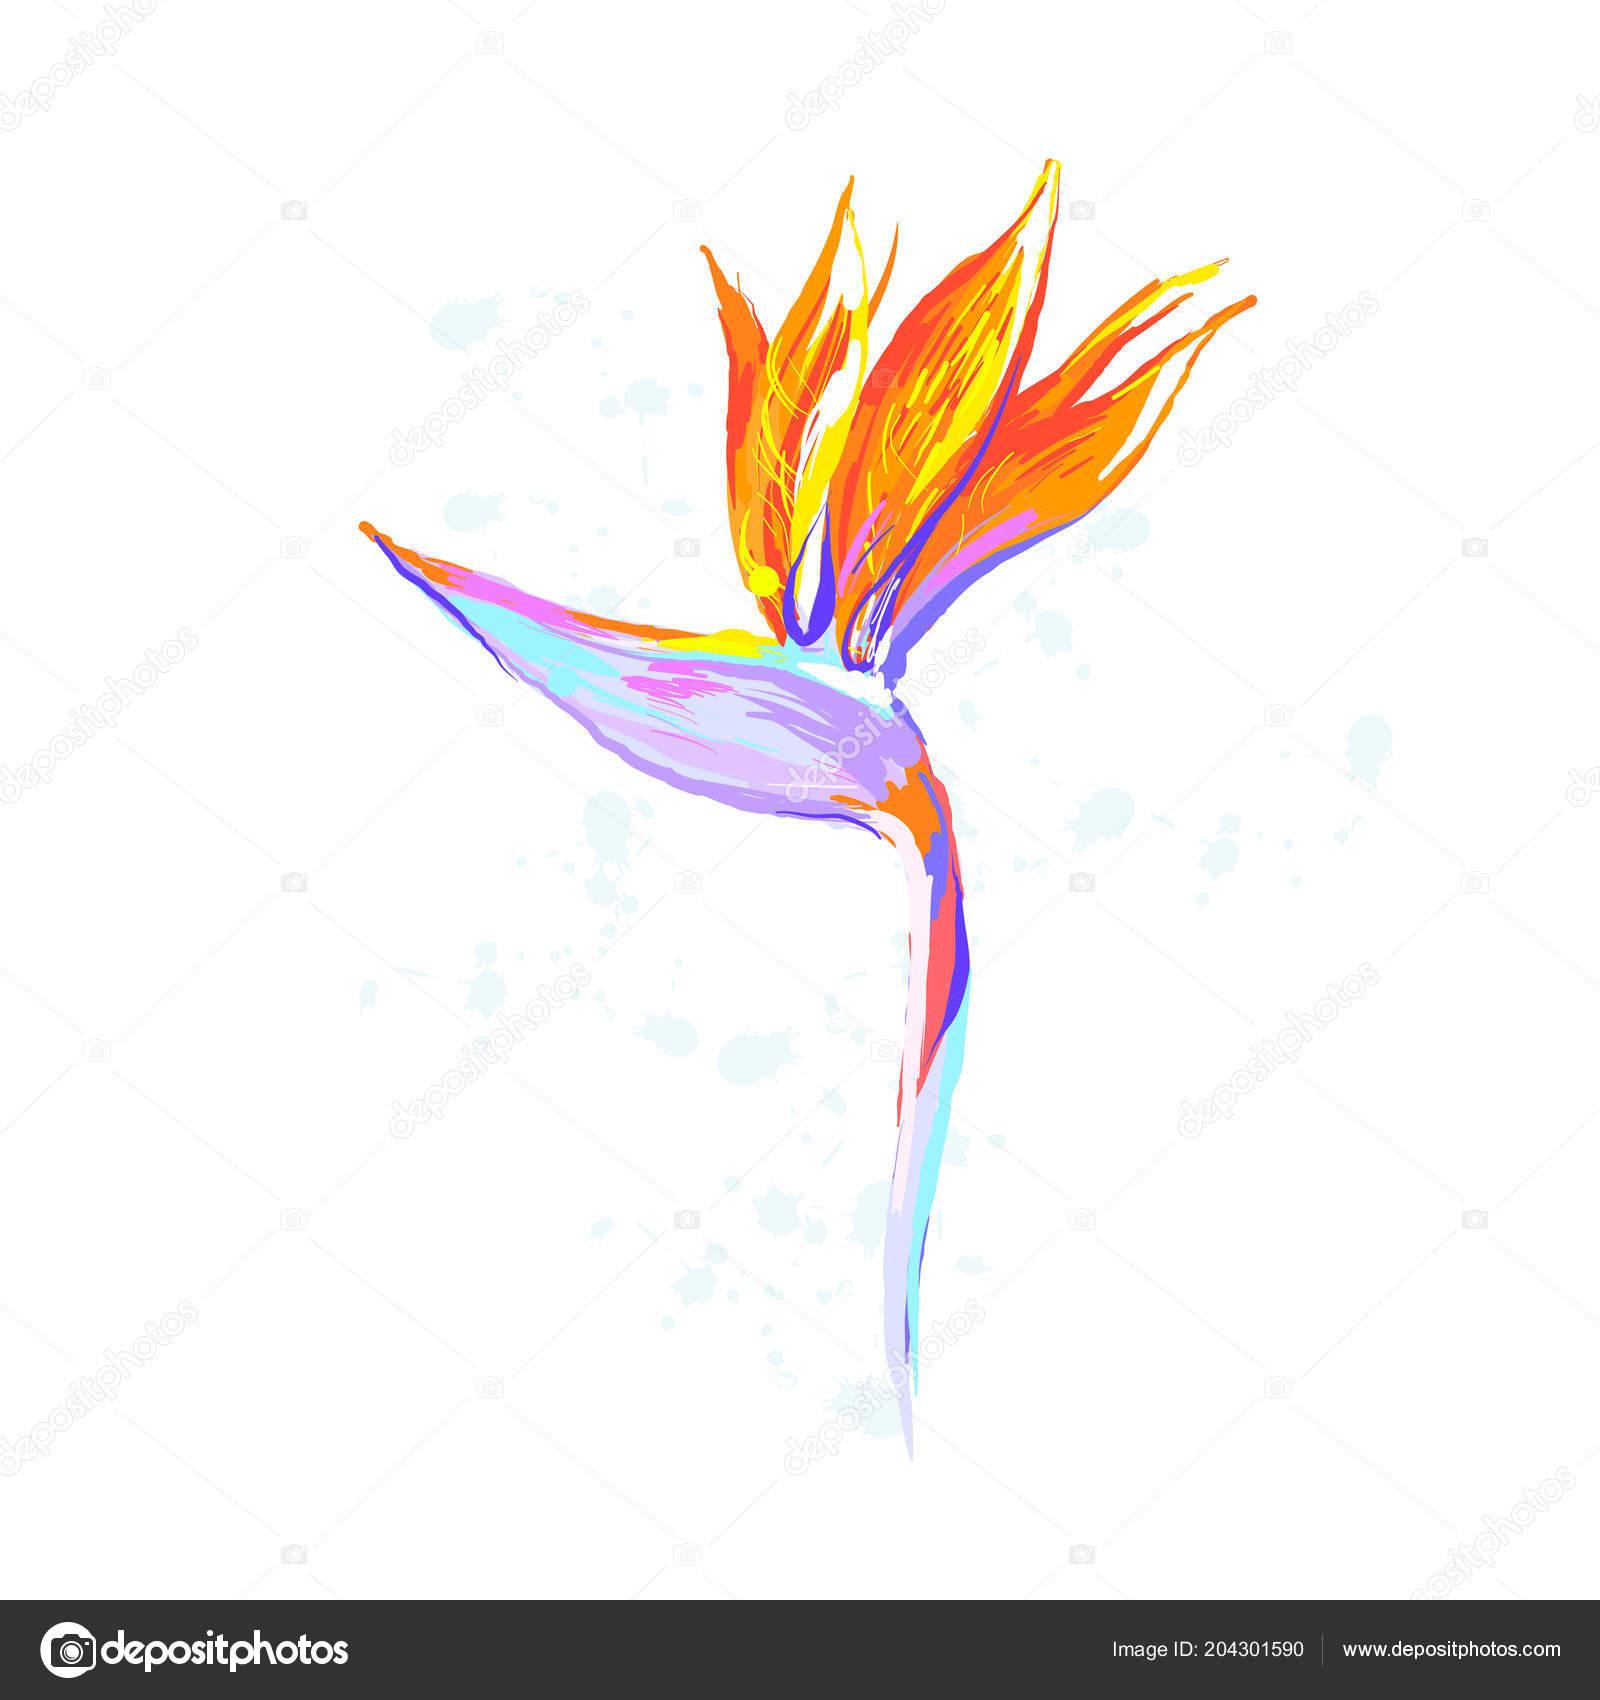 Strelitzia Reginae Flower Bird Of Paradise Crane Flower On White